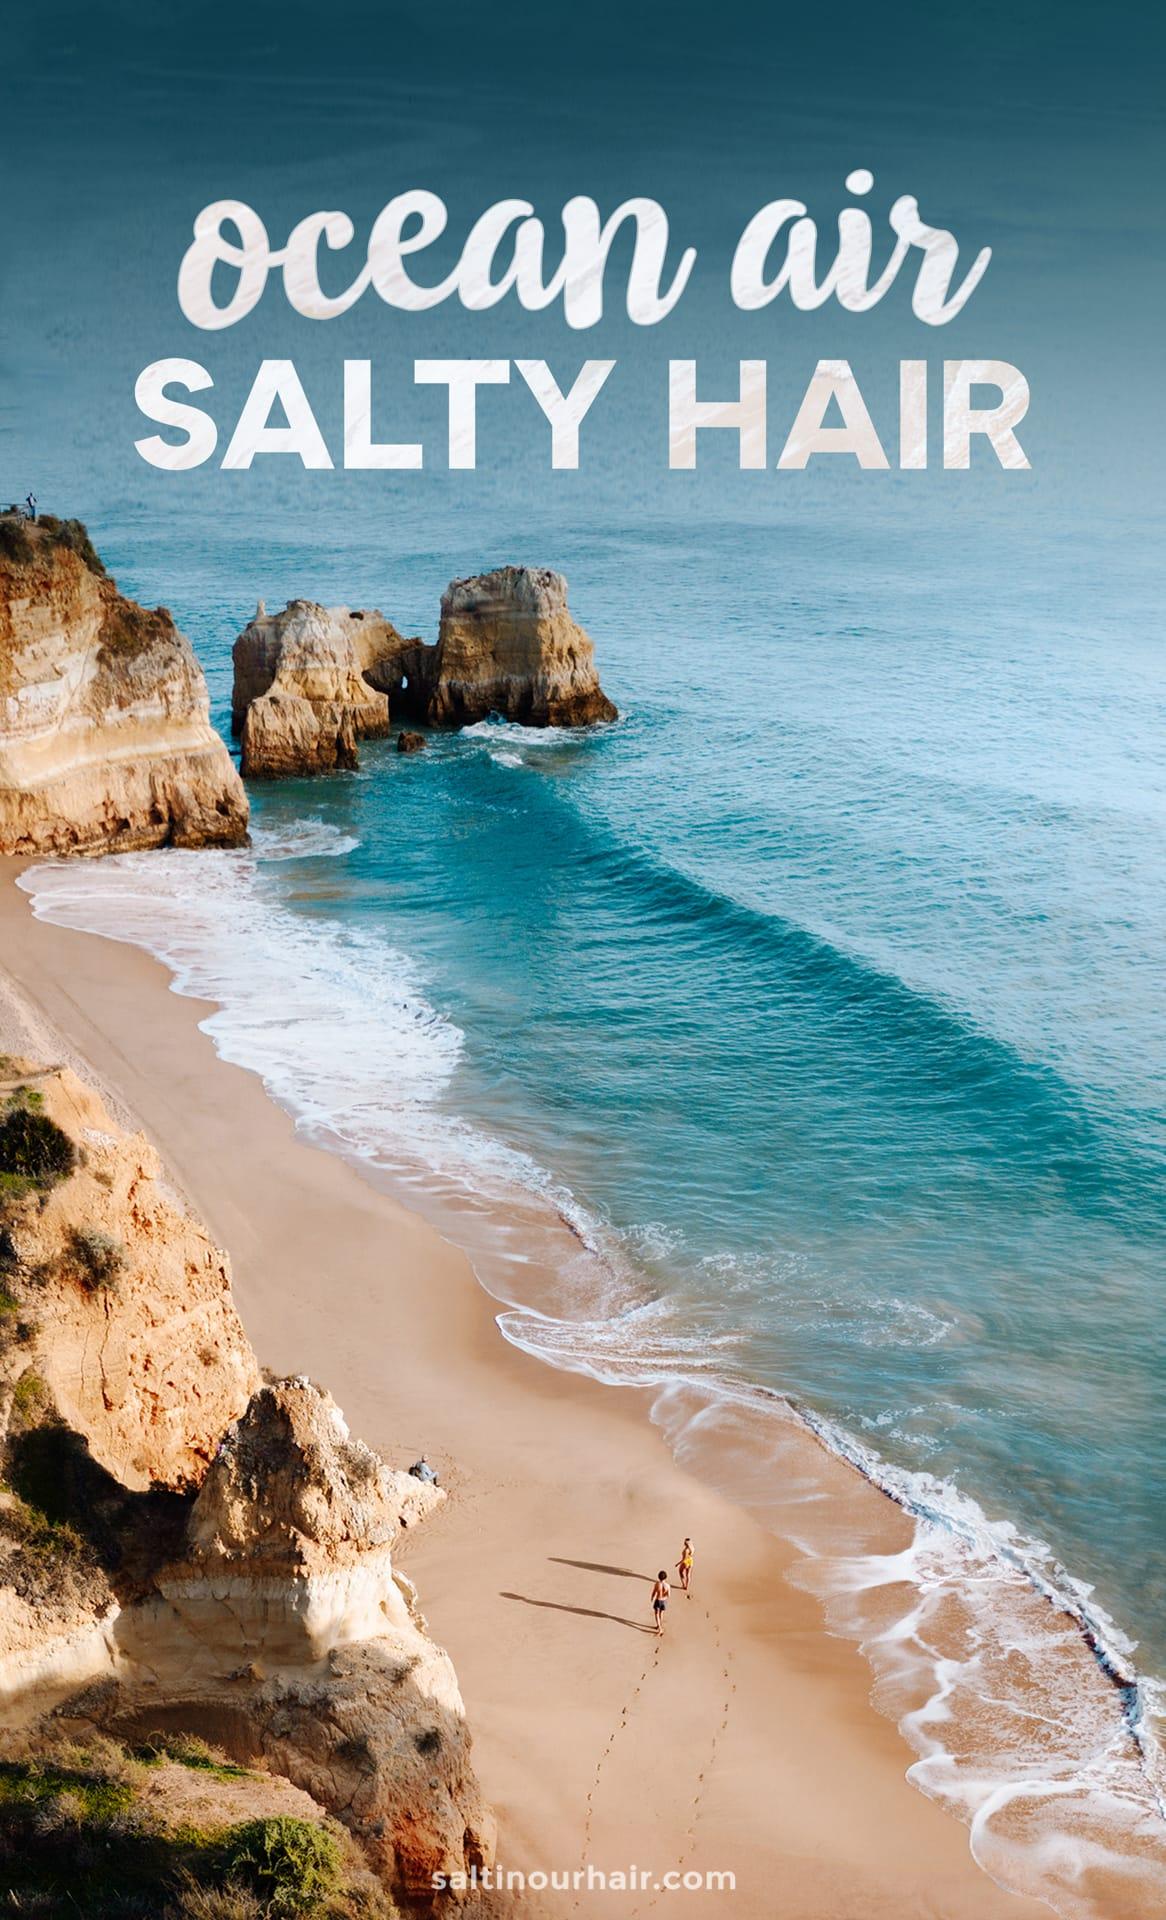 travel quote ocean air salty hair